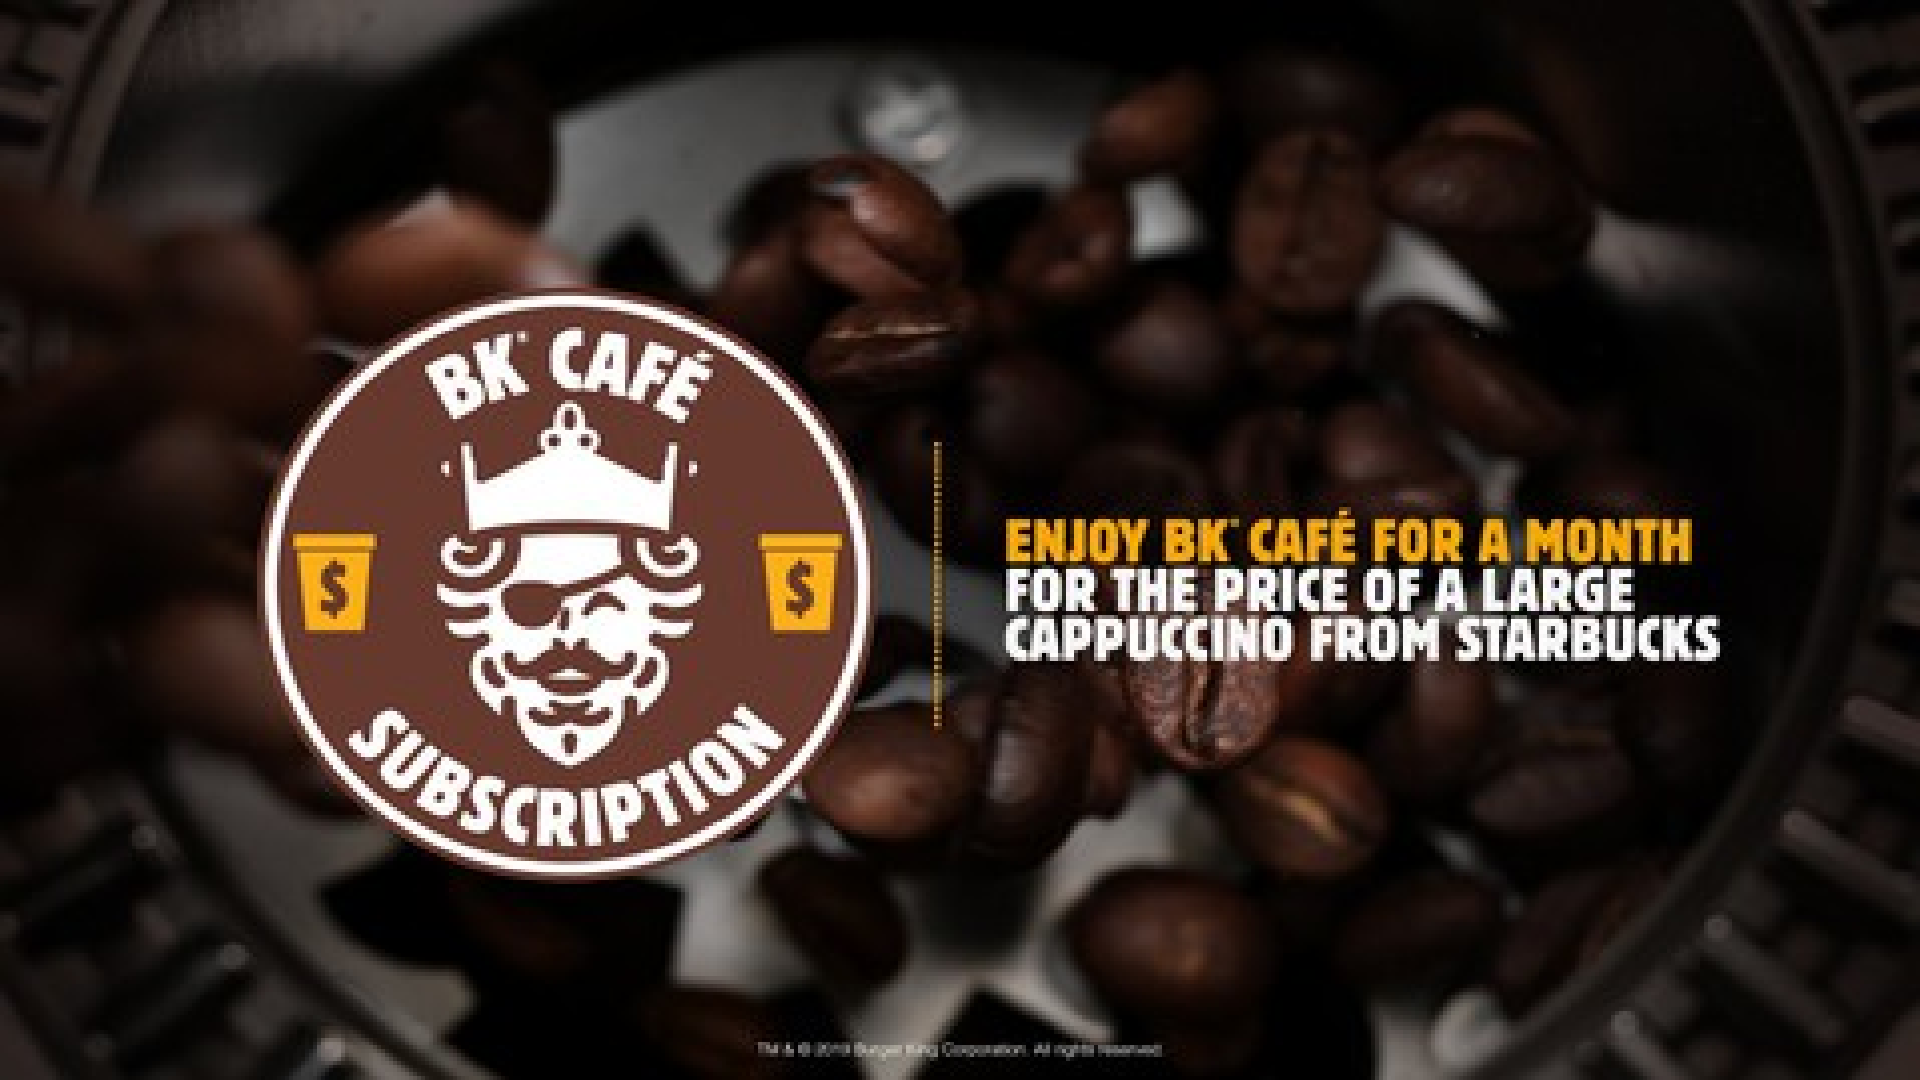 Burger king coffee subscription source-bk